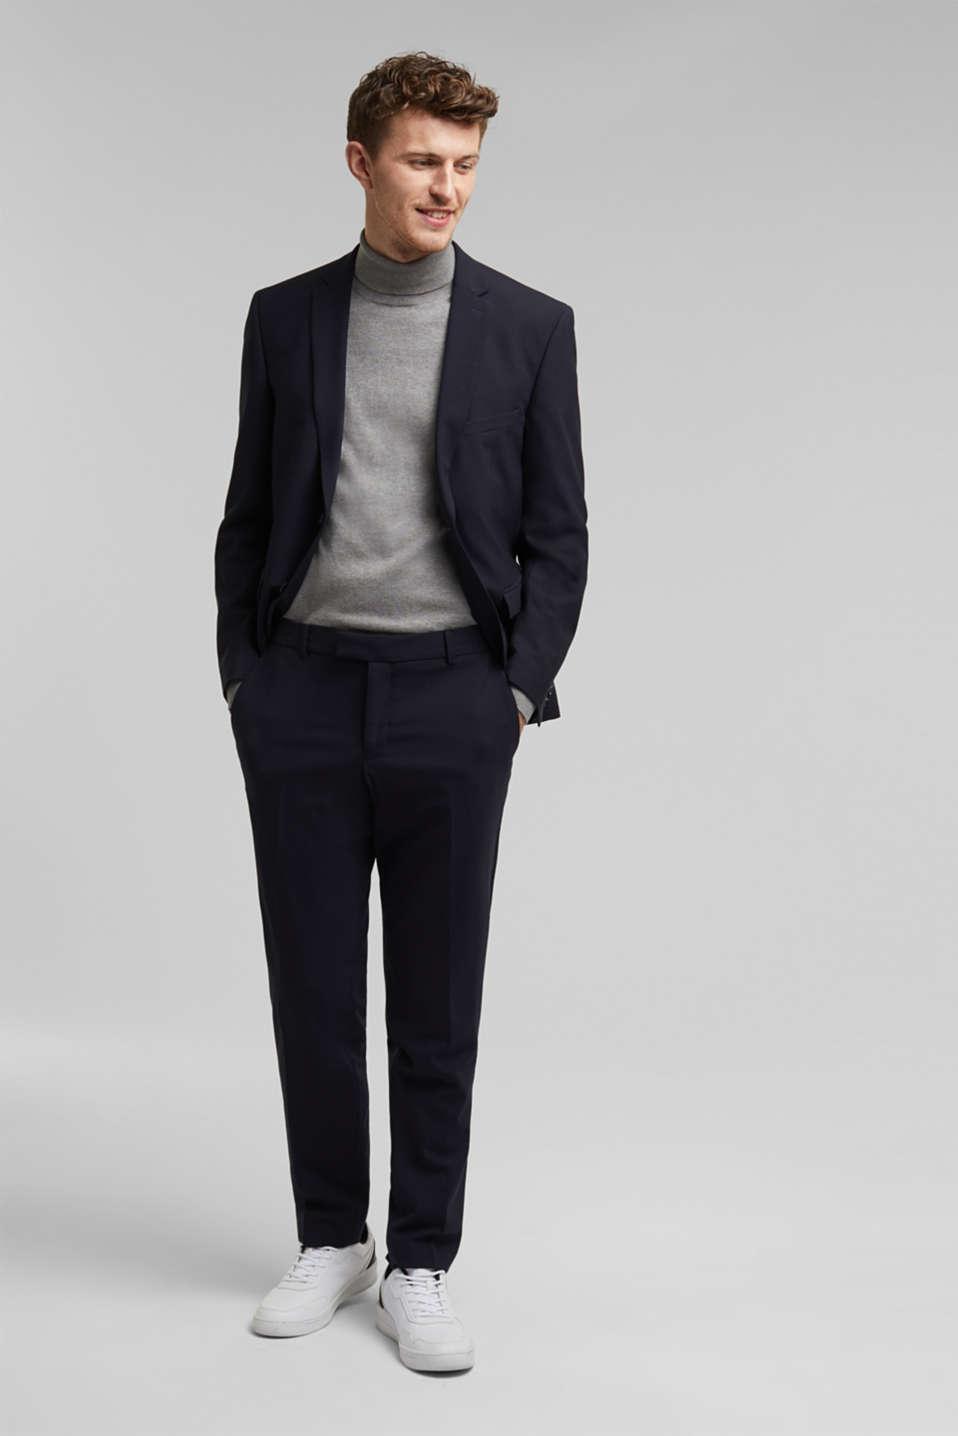 ACTIVE SUIT tailored jacket, wool blend, DARK BLUE, detail image number 1